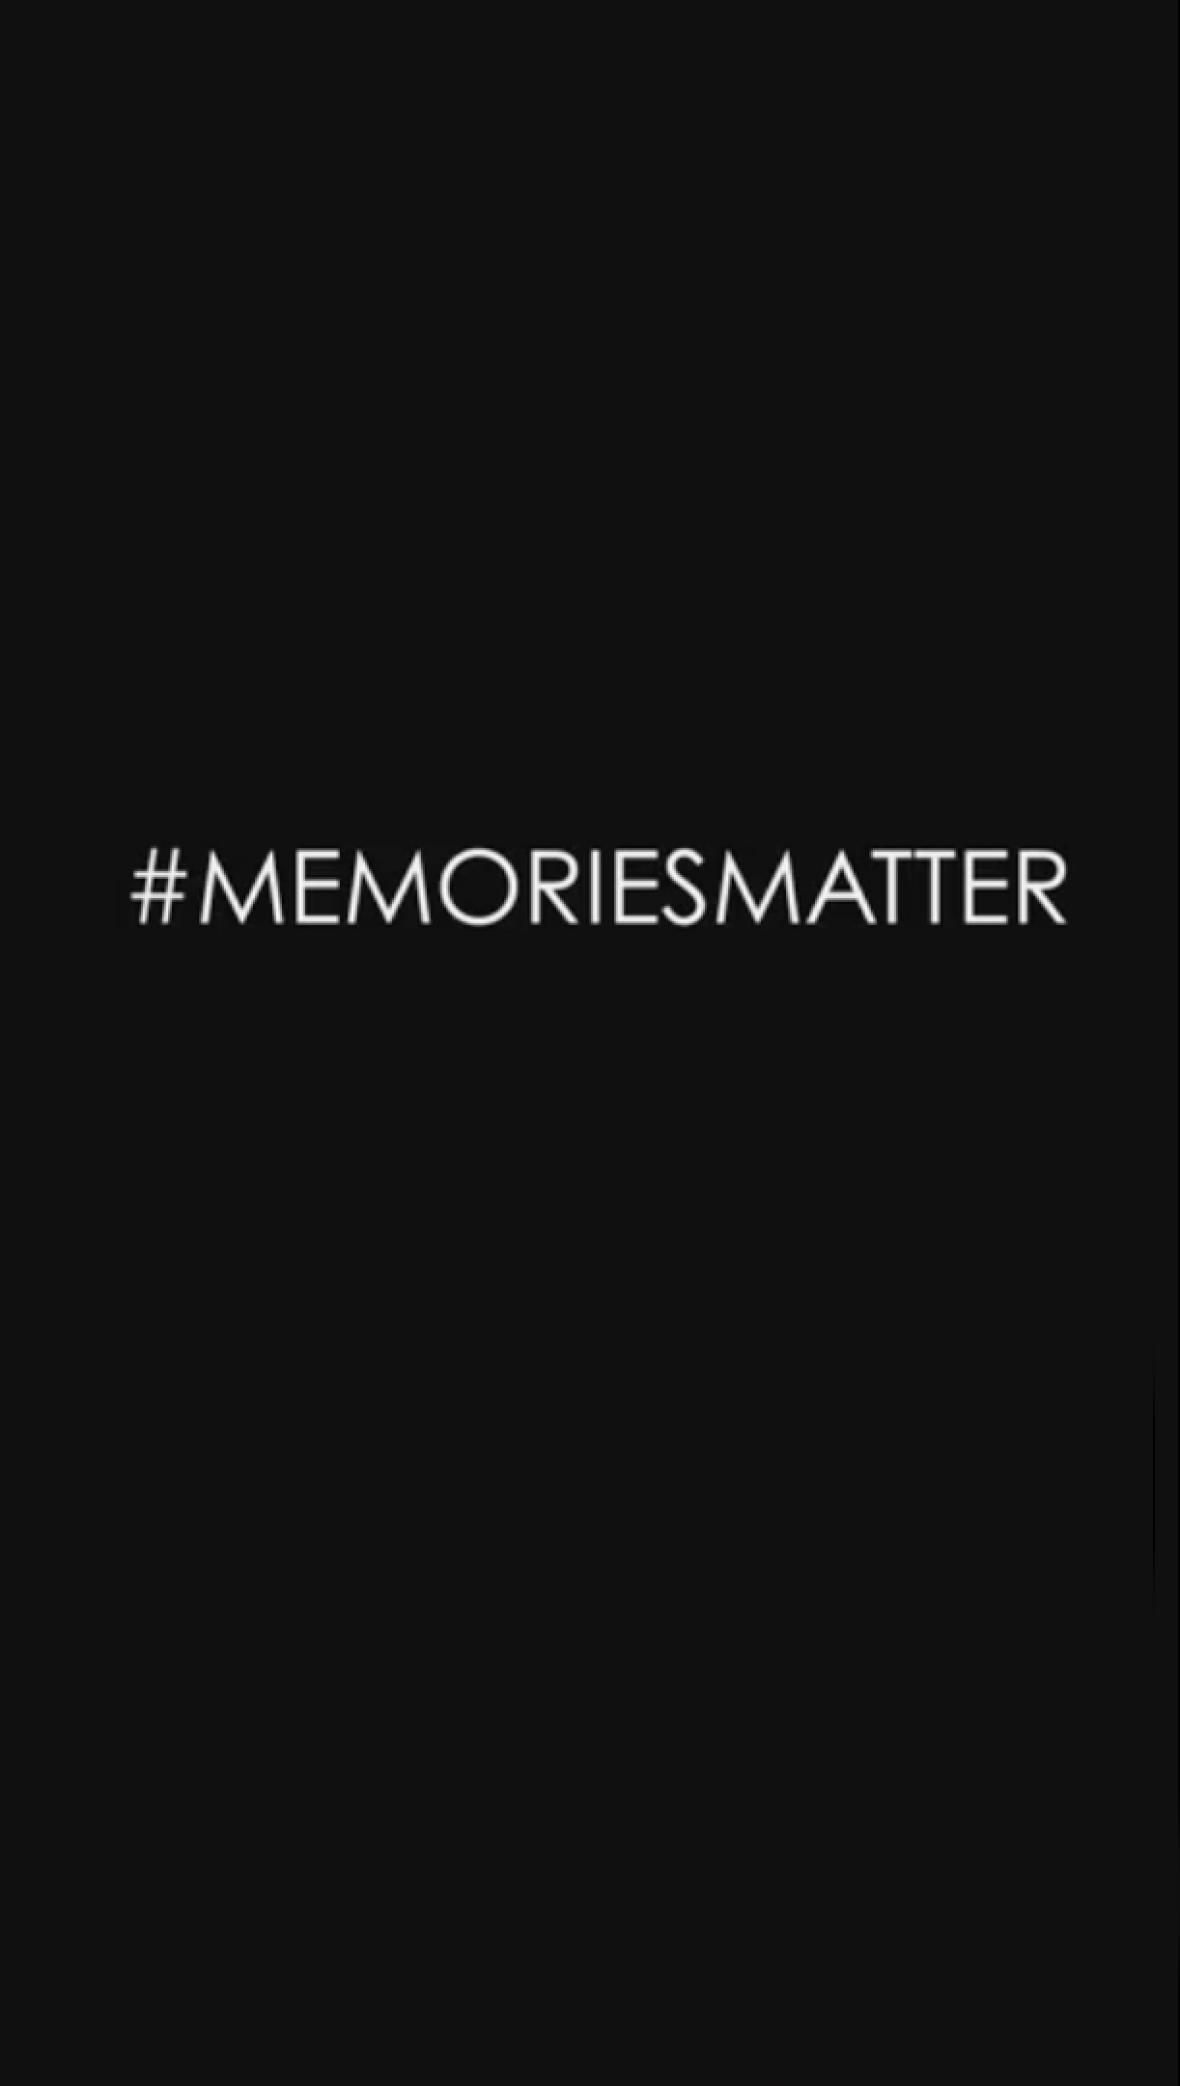 Snapchat shares the memories for World Alzheimer's Day in UAE